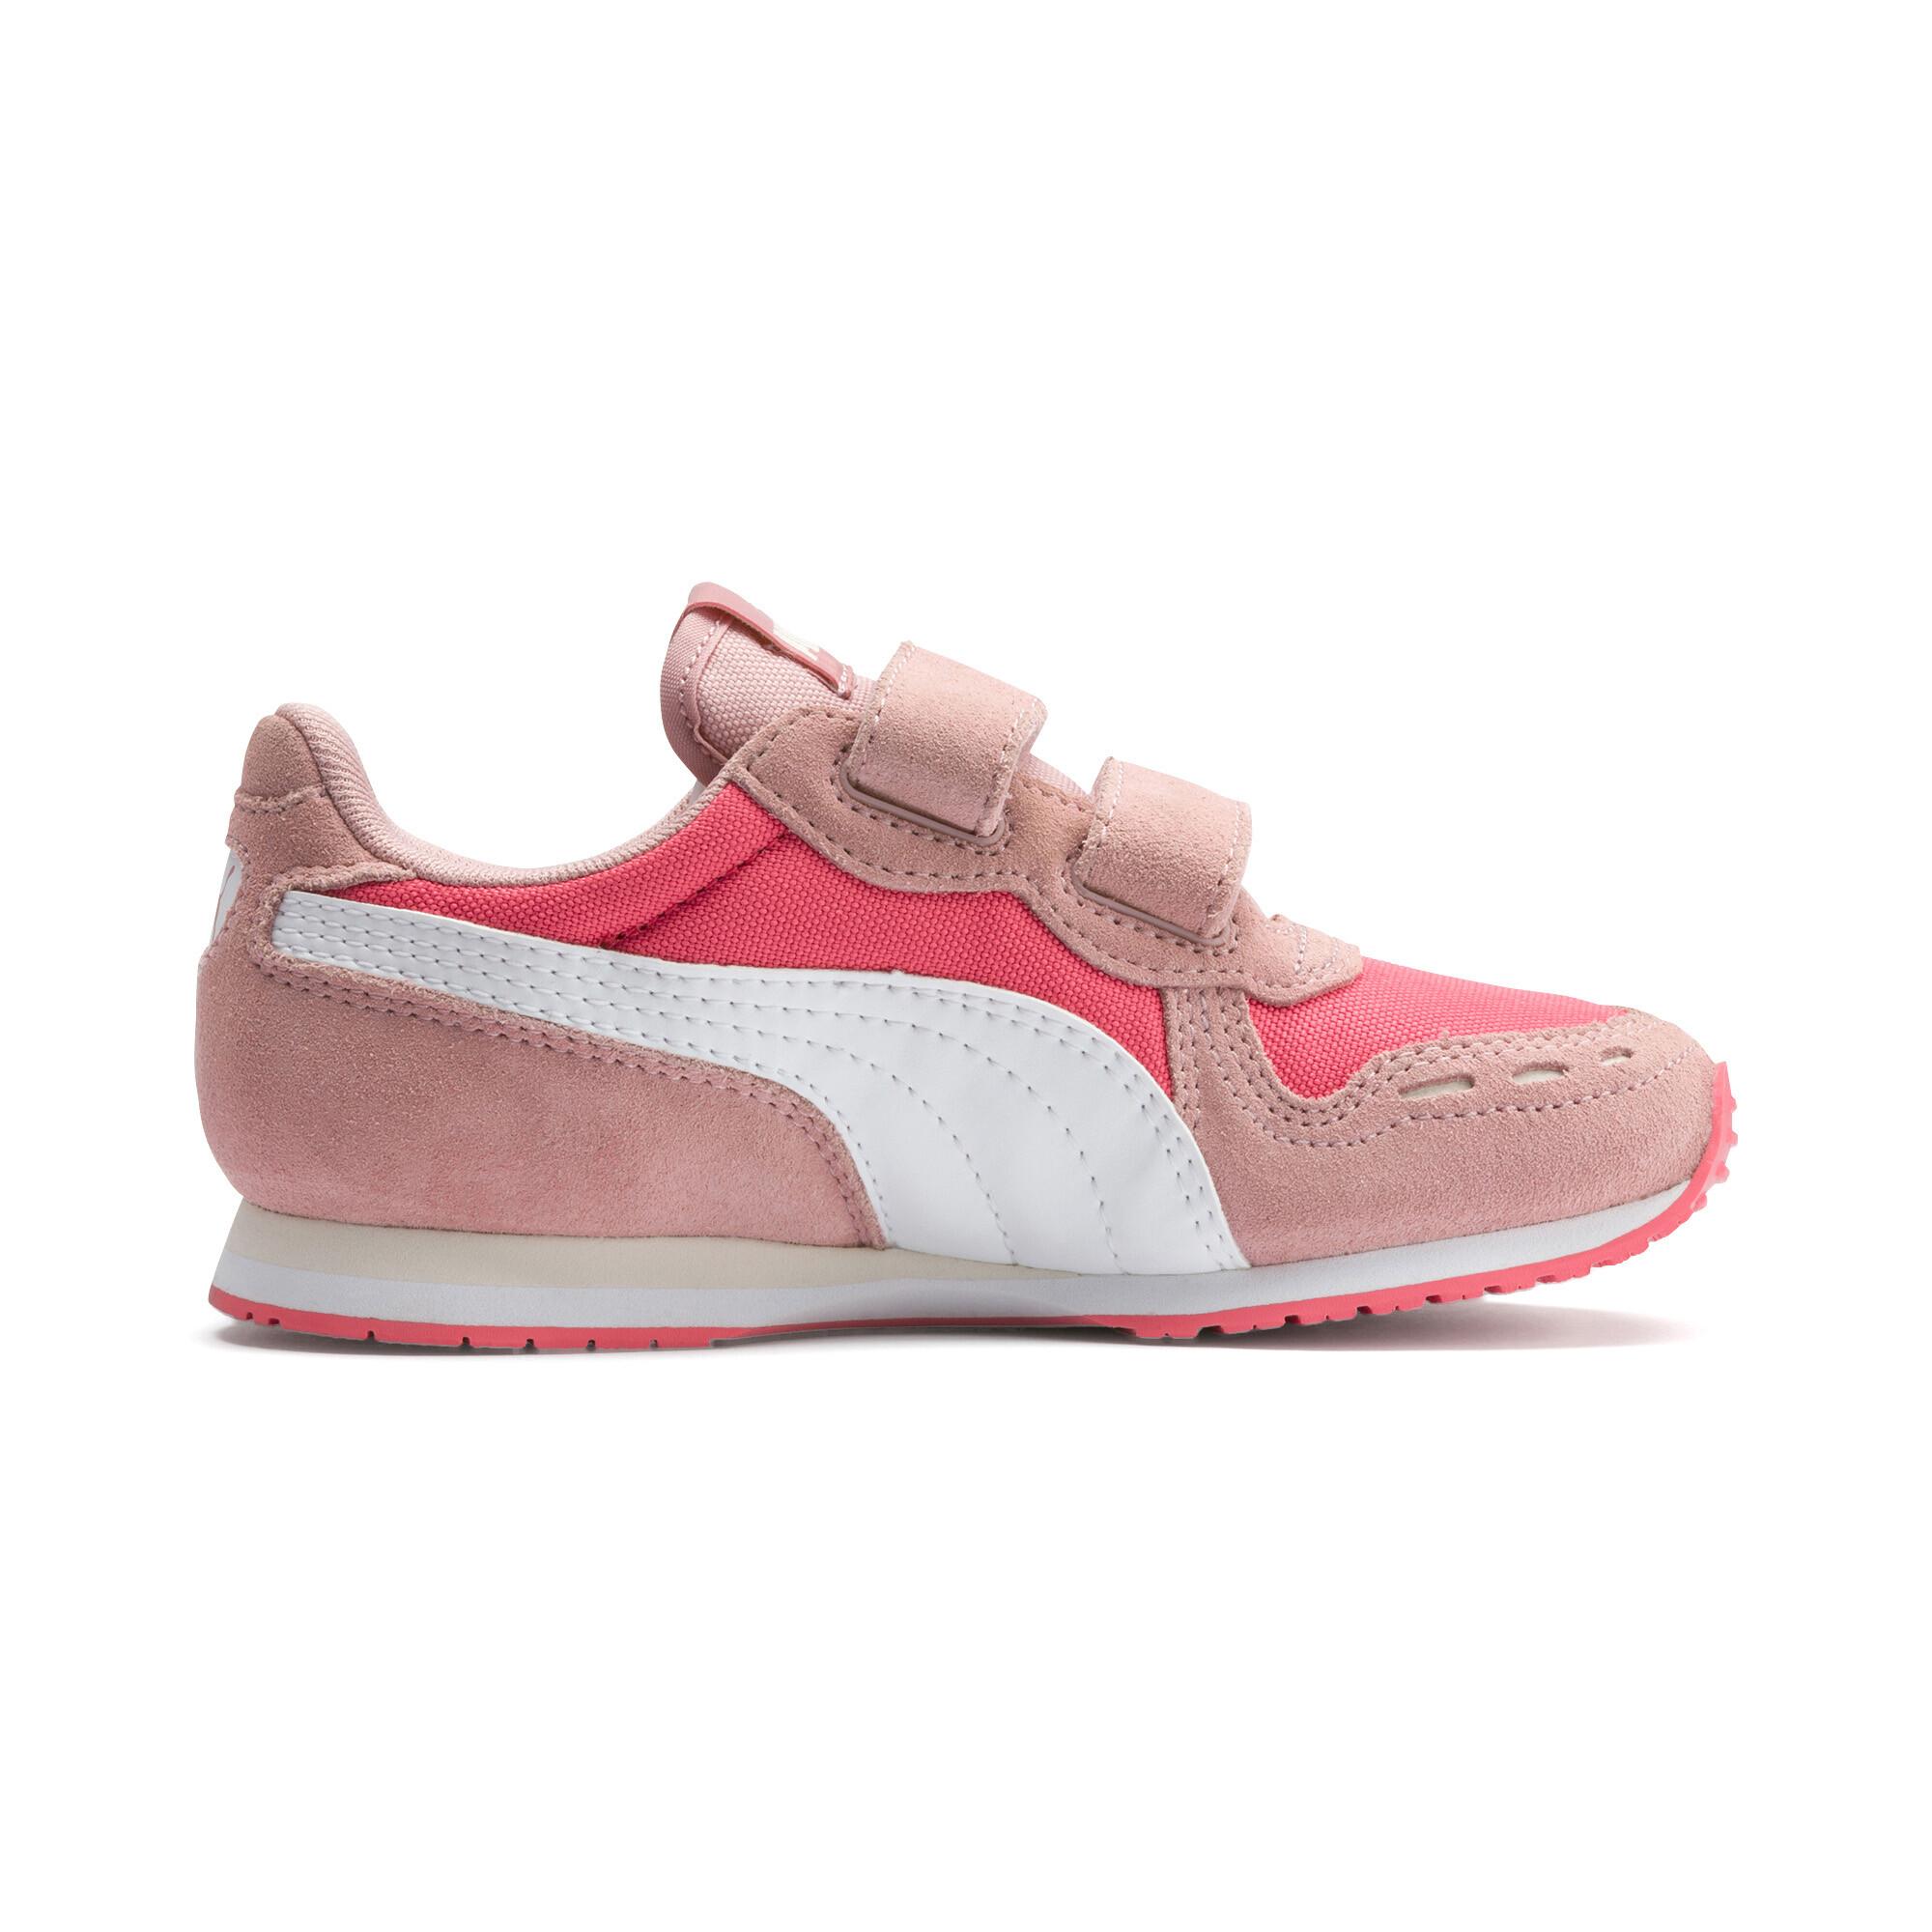 PUMA-Cabana-Racer-Little-Kids-039-Shoes-Kids-Shoe-Kids thumbnail 17